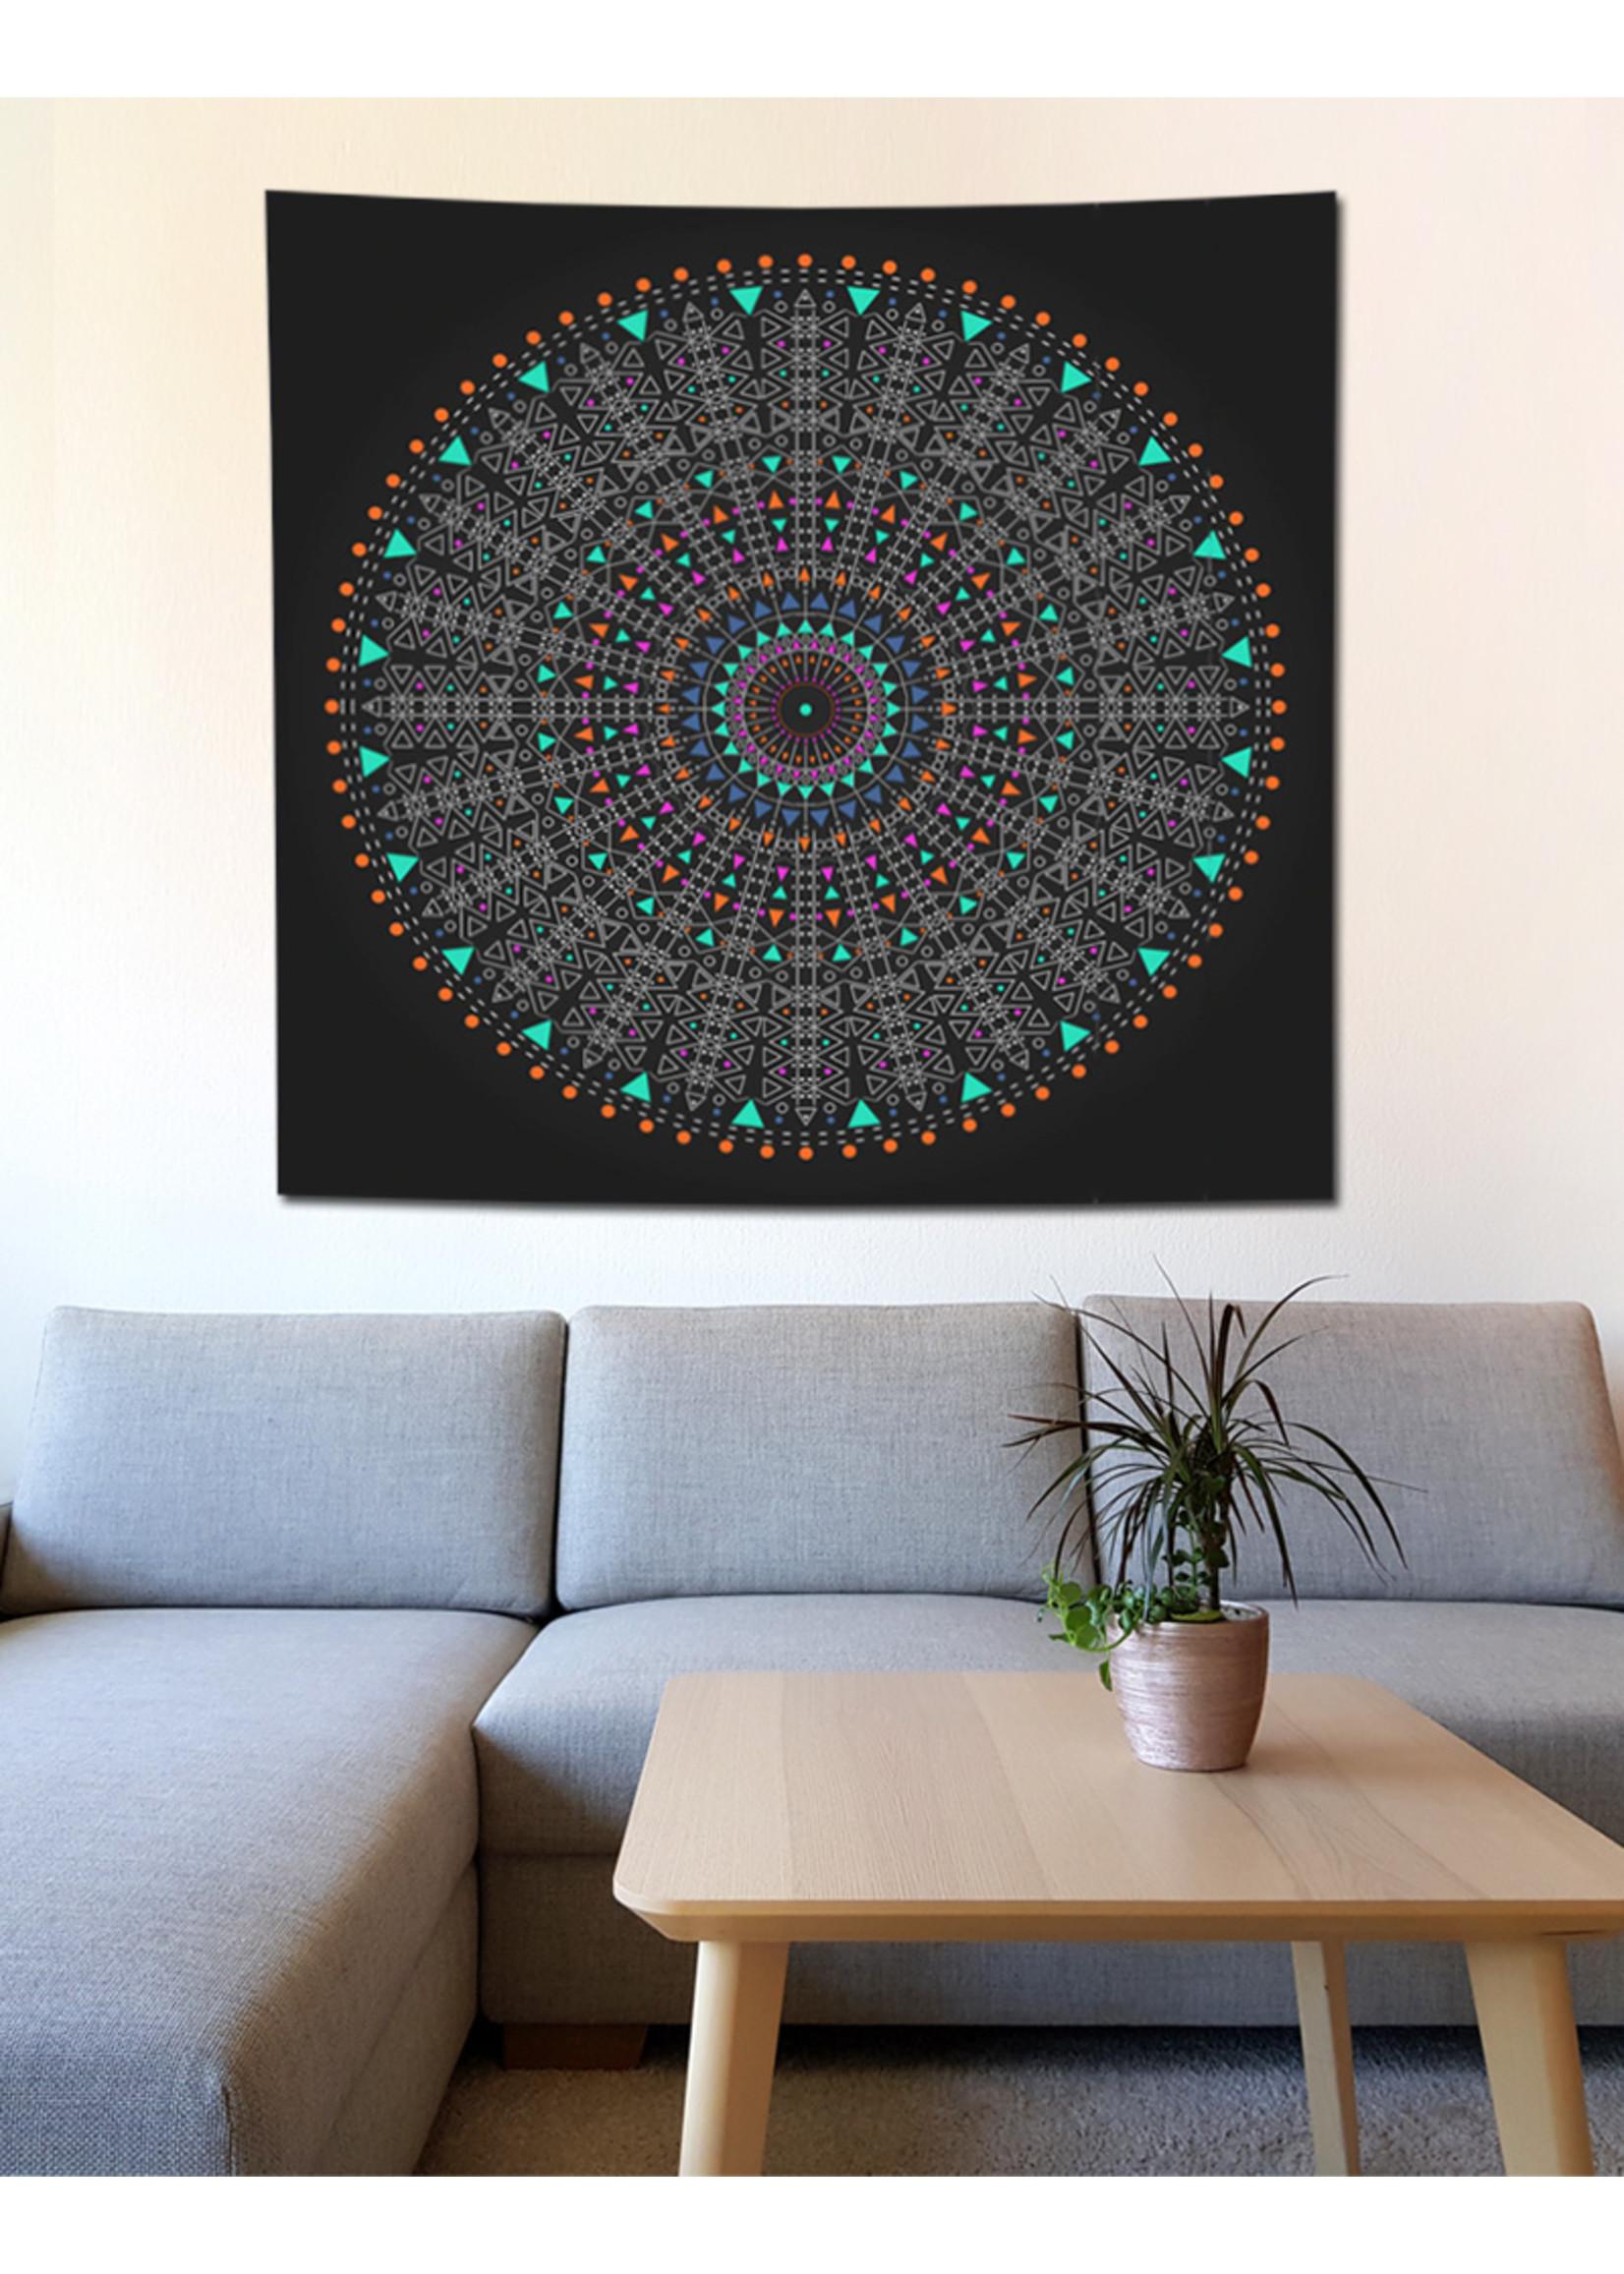 Wandtuch Meditation Mandala, 150 x 150 cm